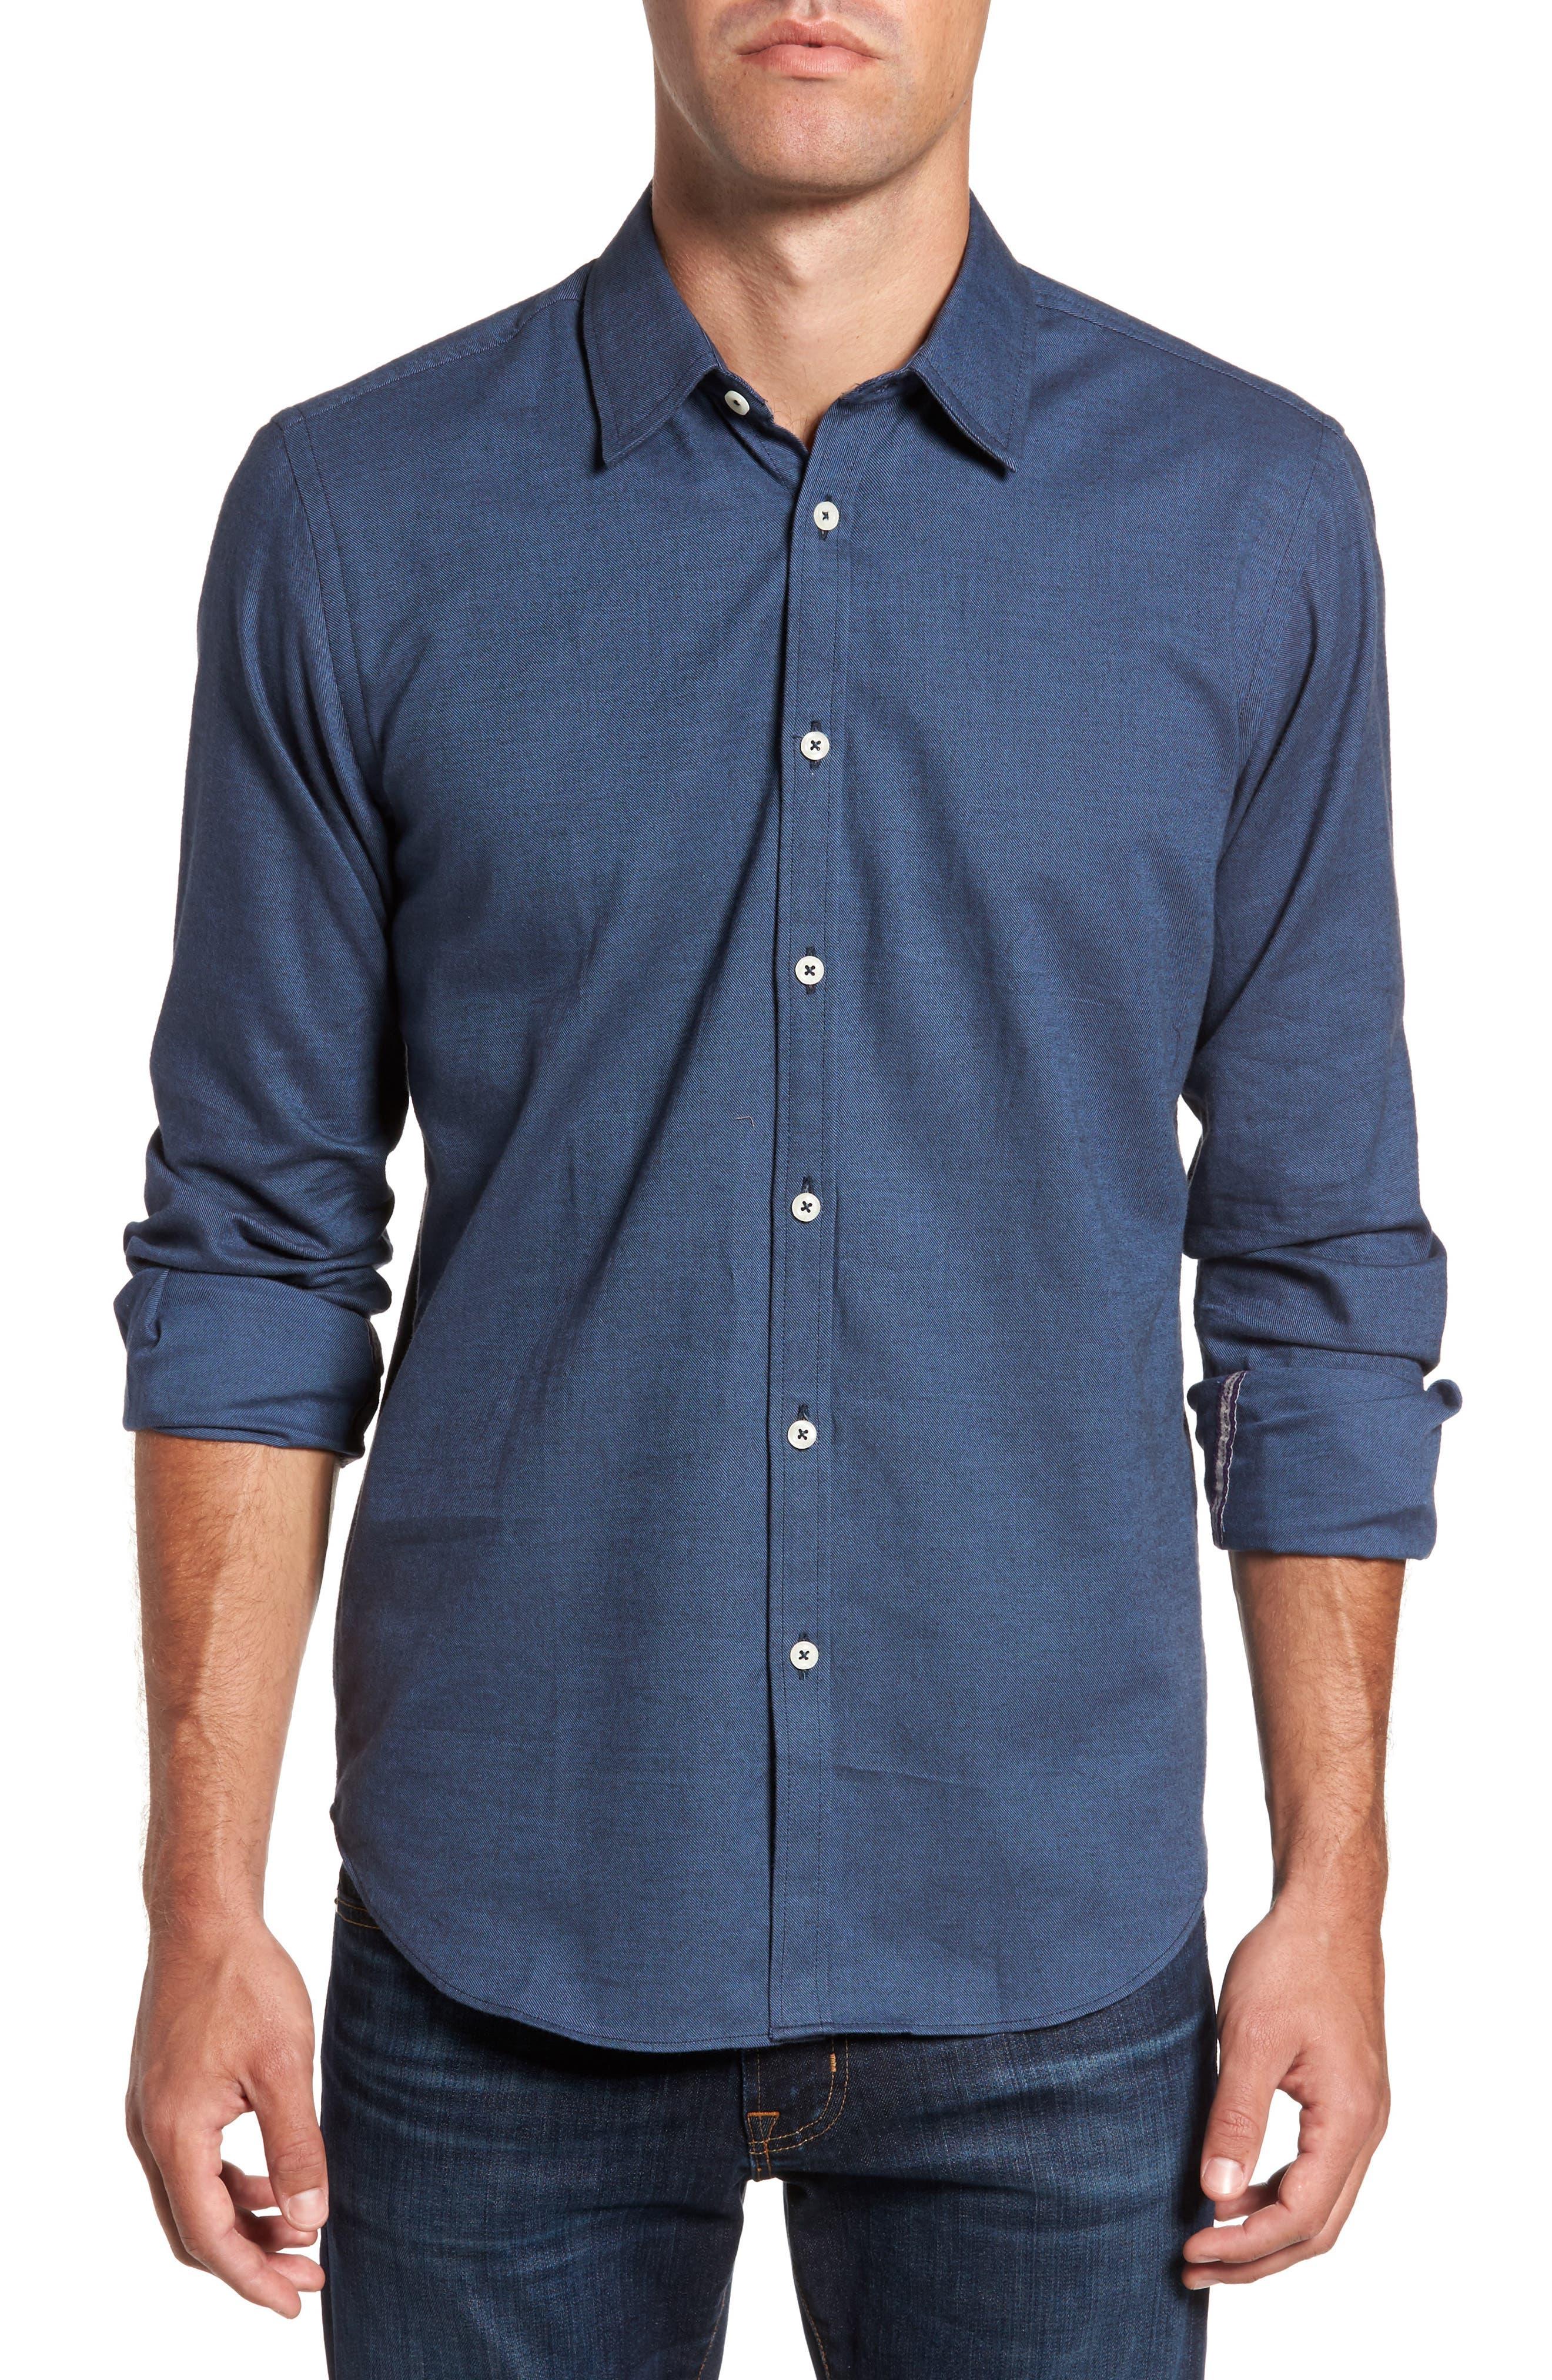 Main Image - Jeremy Argyle Slim Fit Solid Sport Shirt